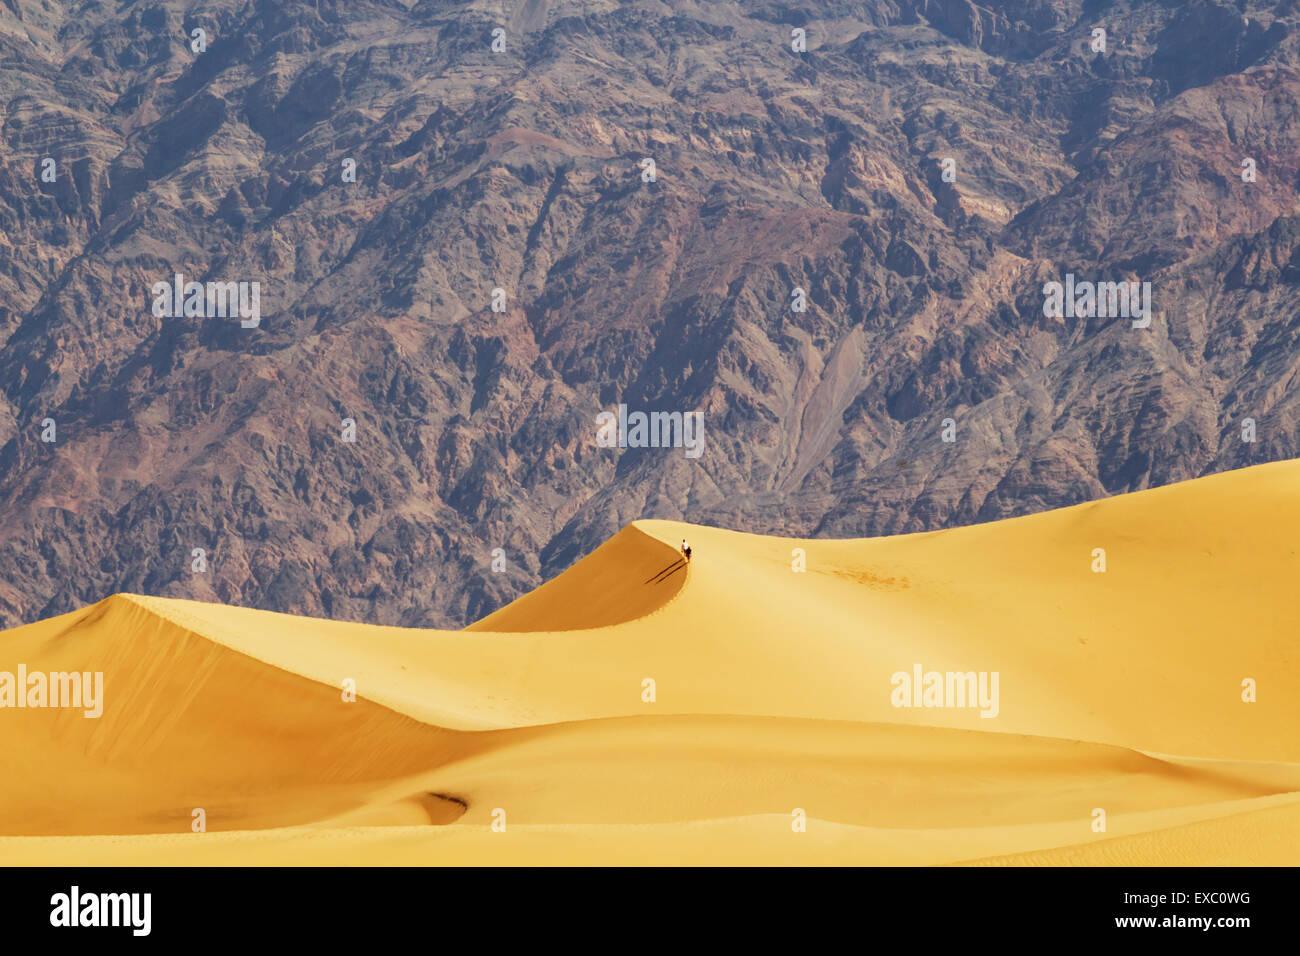 Mesquite sand dunes, Death Valley, California, USA - Stock Image